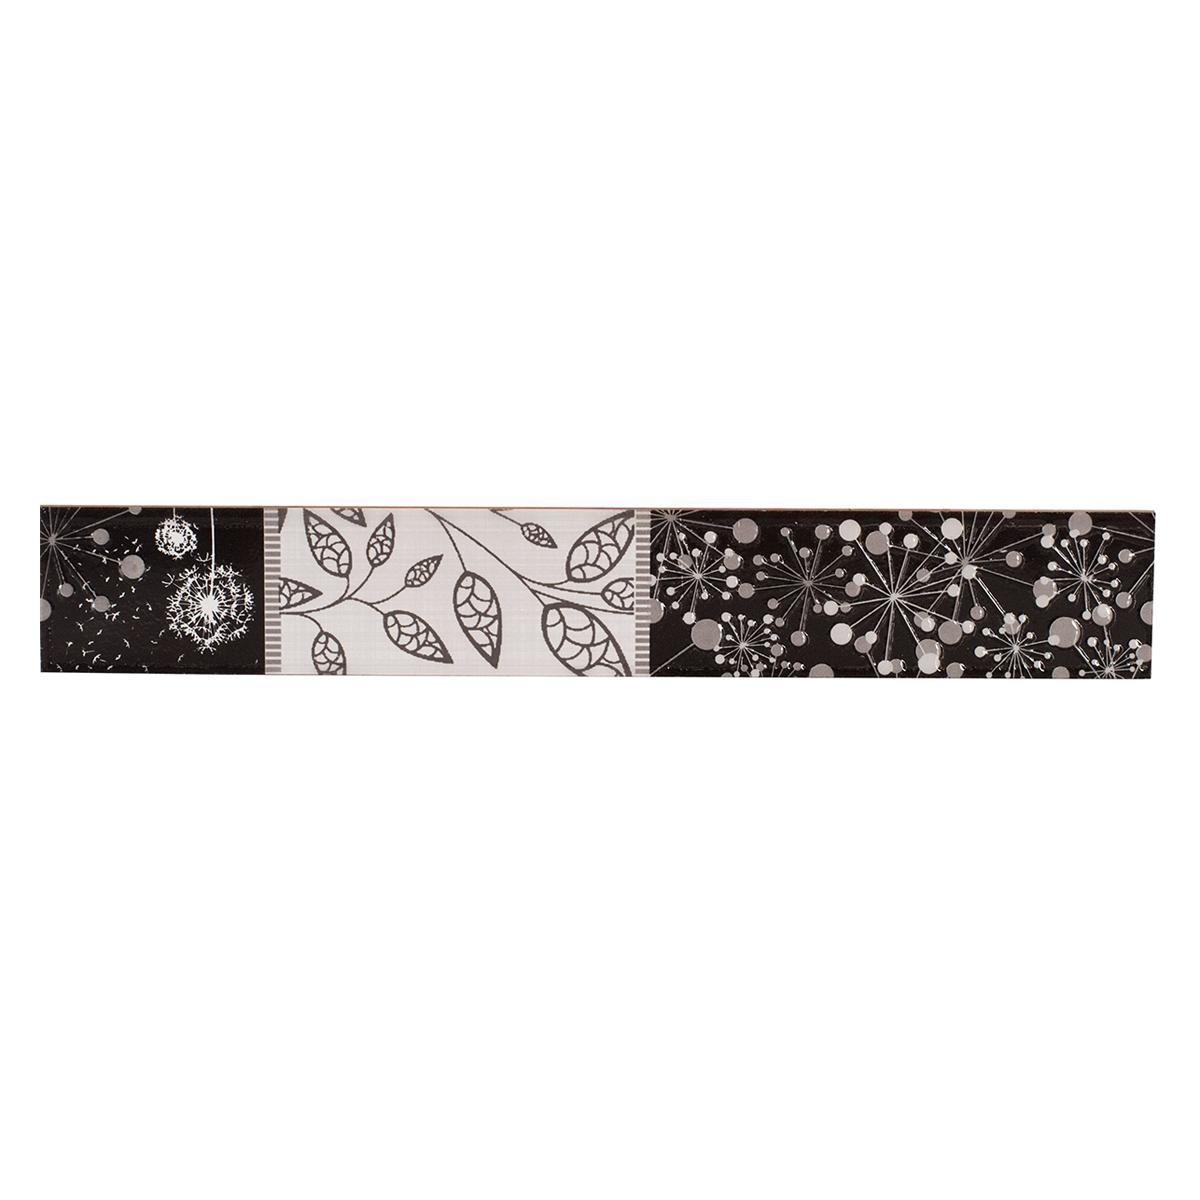 Listelo Decorado Negro Brillante - 6X39.5 cm - 1 pza